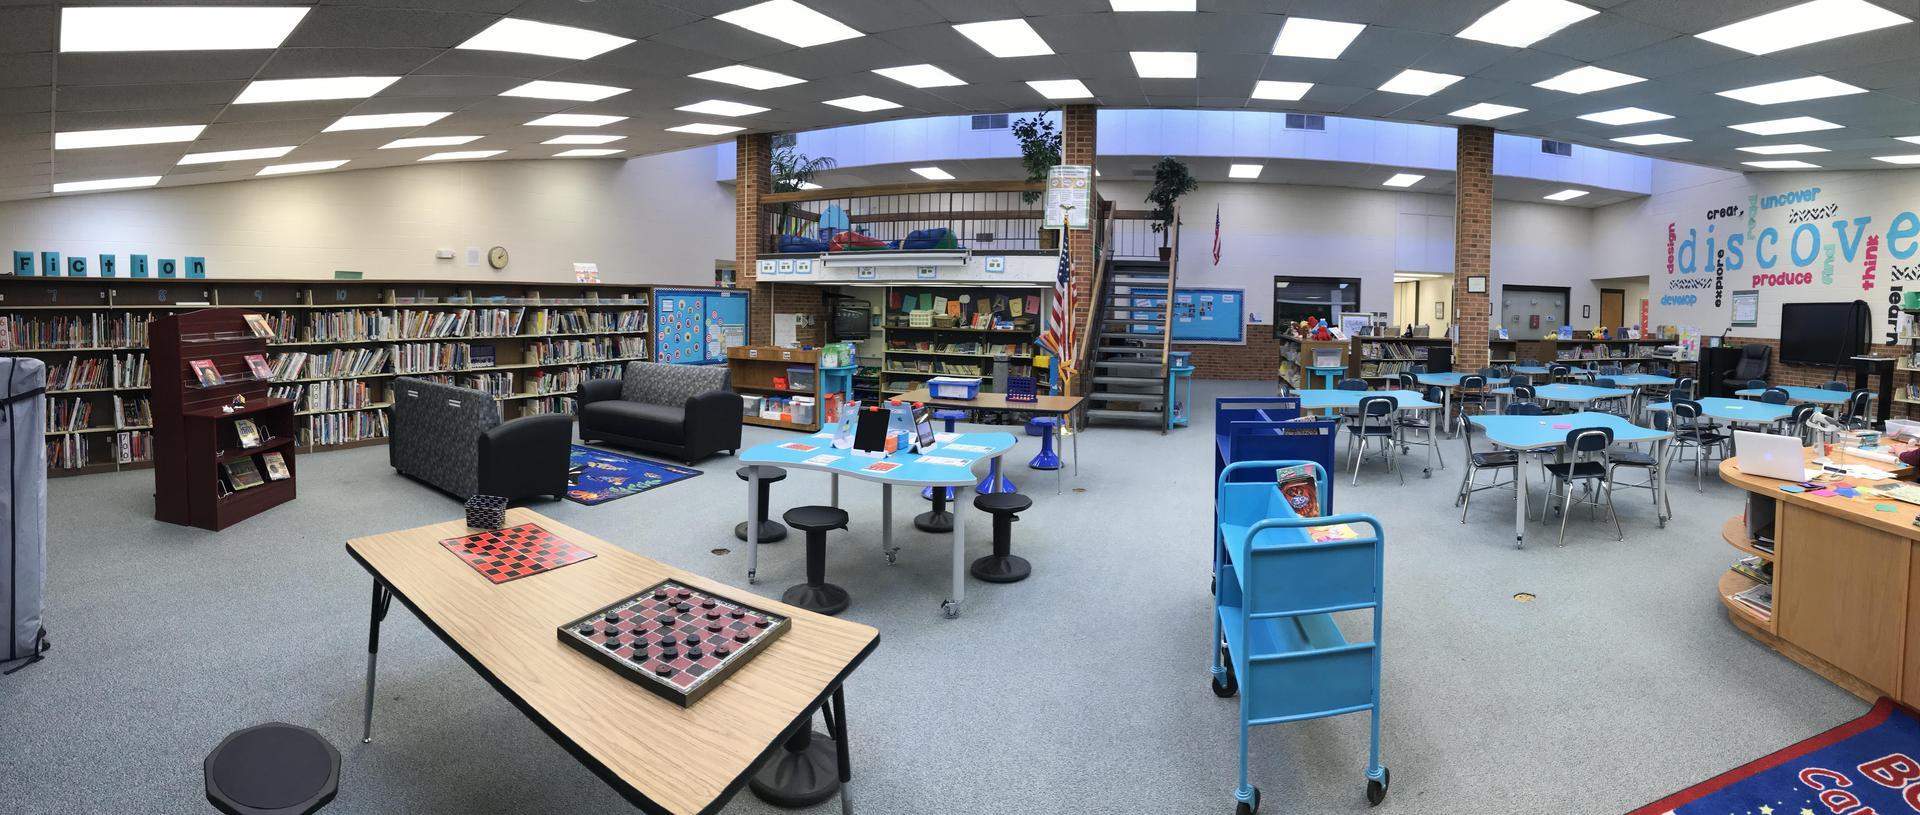 Image of Media Center